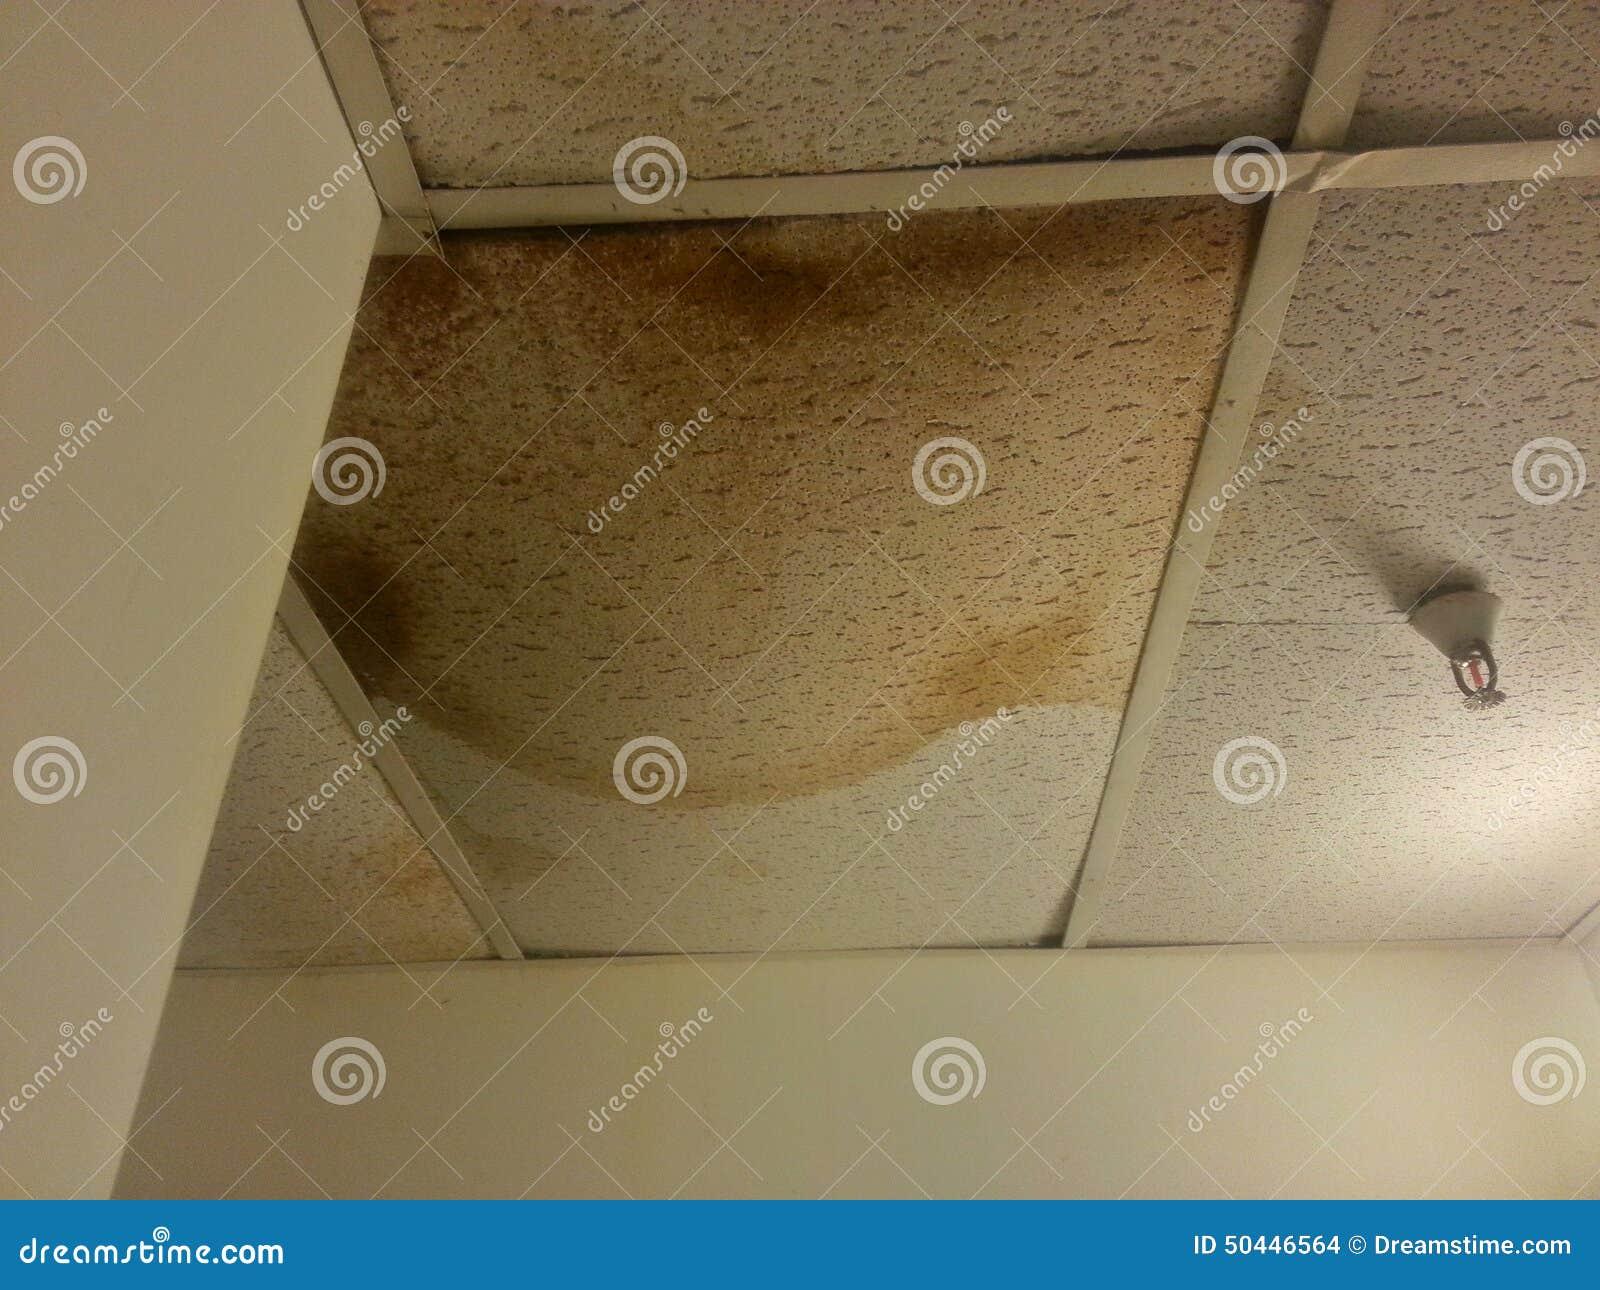 Ceiling tile needs repair water damage stock photo image 50446564 ceiling tile needs repair water damage doublecrazyfo Choice Image